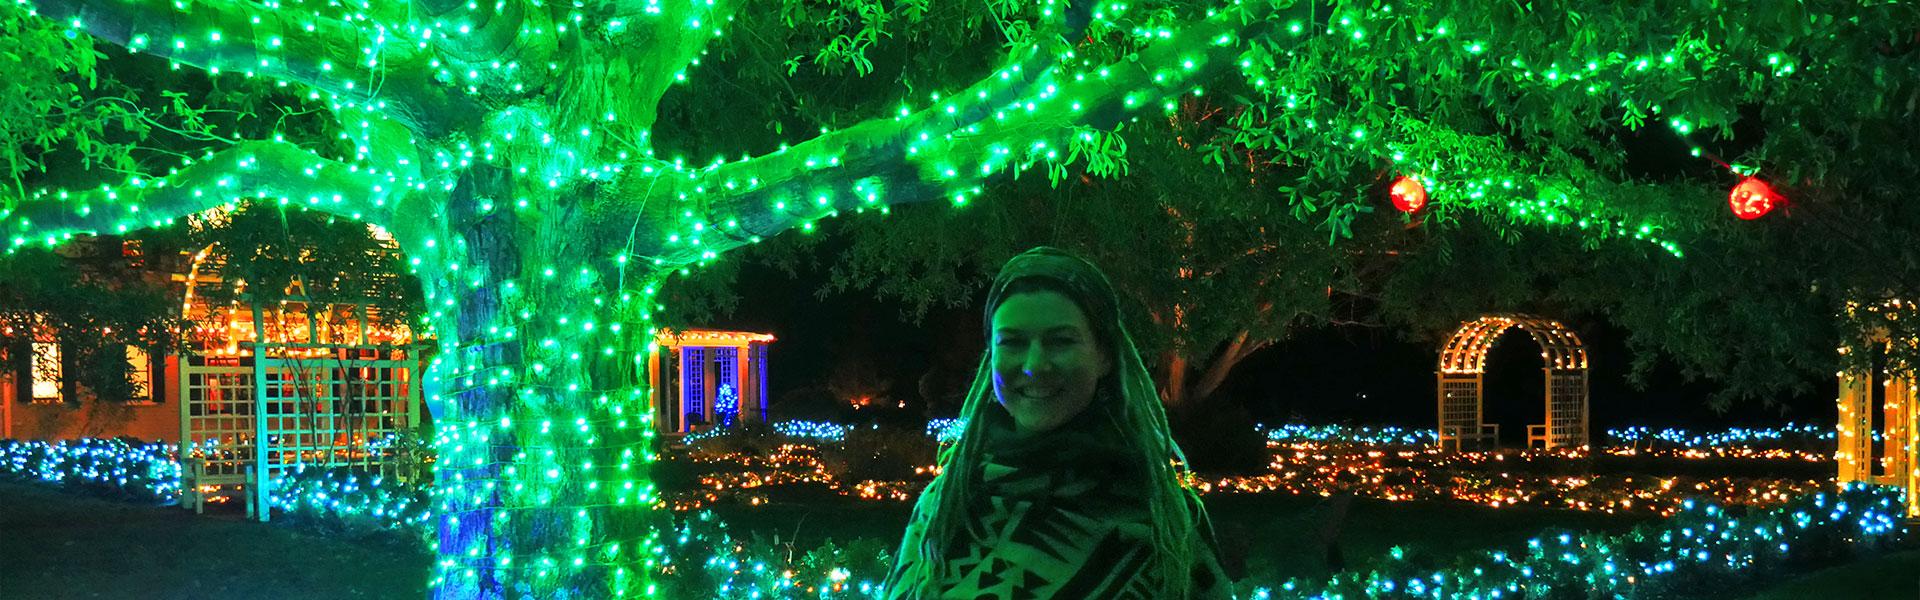 Rasta girl in front of illuminated tree at Gardenfest of Lights in Richmond, VA